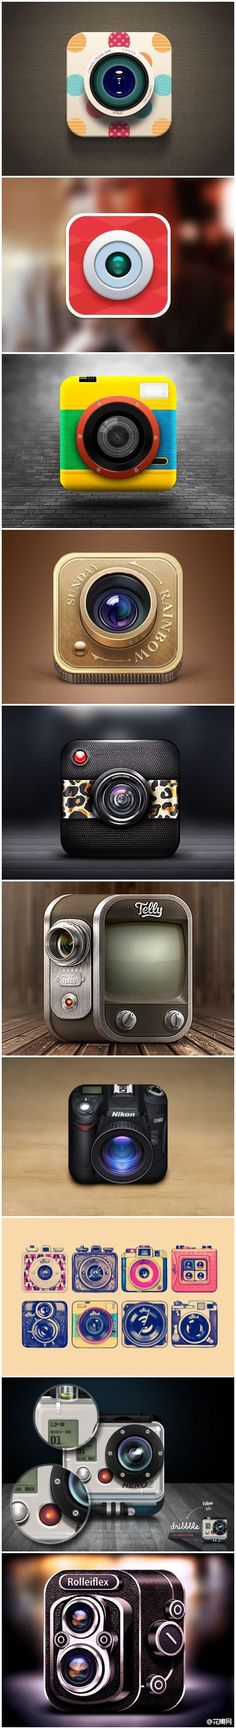 pinterest.com/fra411 #Apps #Icon - Camera Icons + Illustration #icons